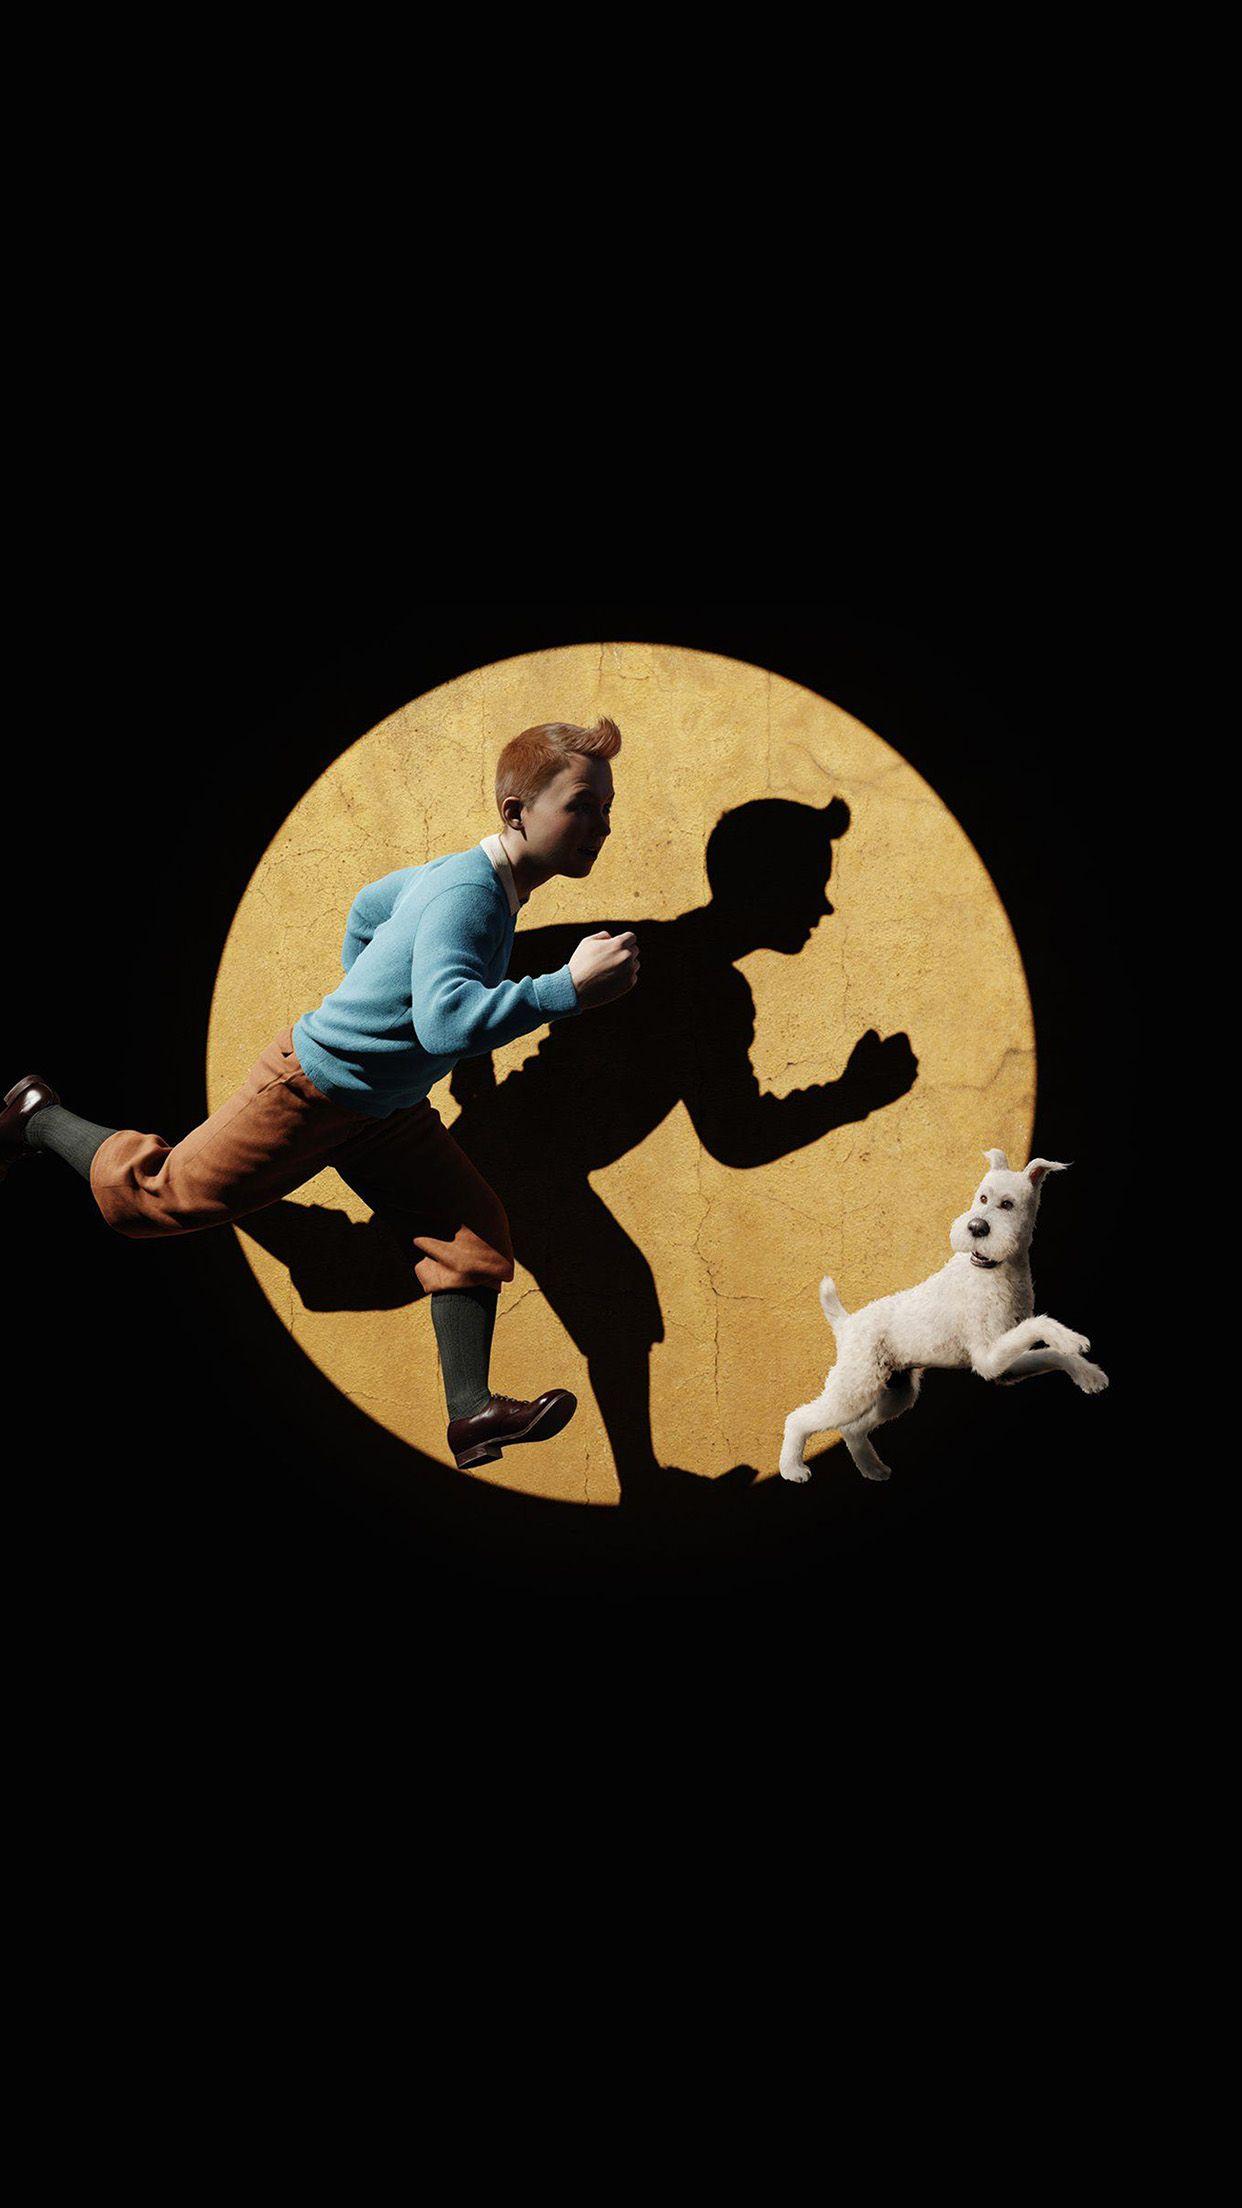 Wallpaper Tintin 3d Art Gelap Android Wallpaper